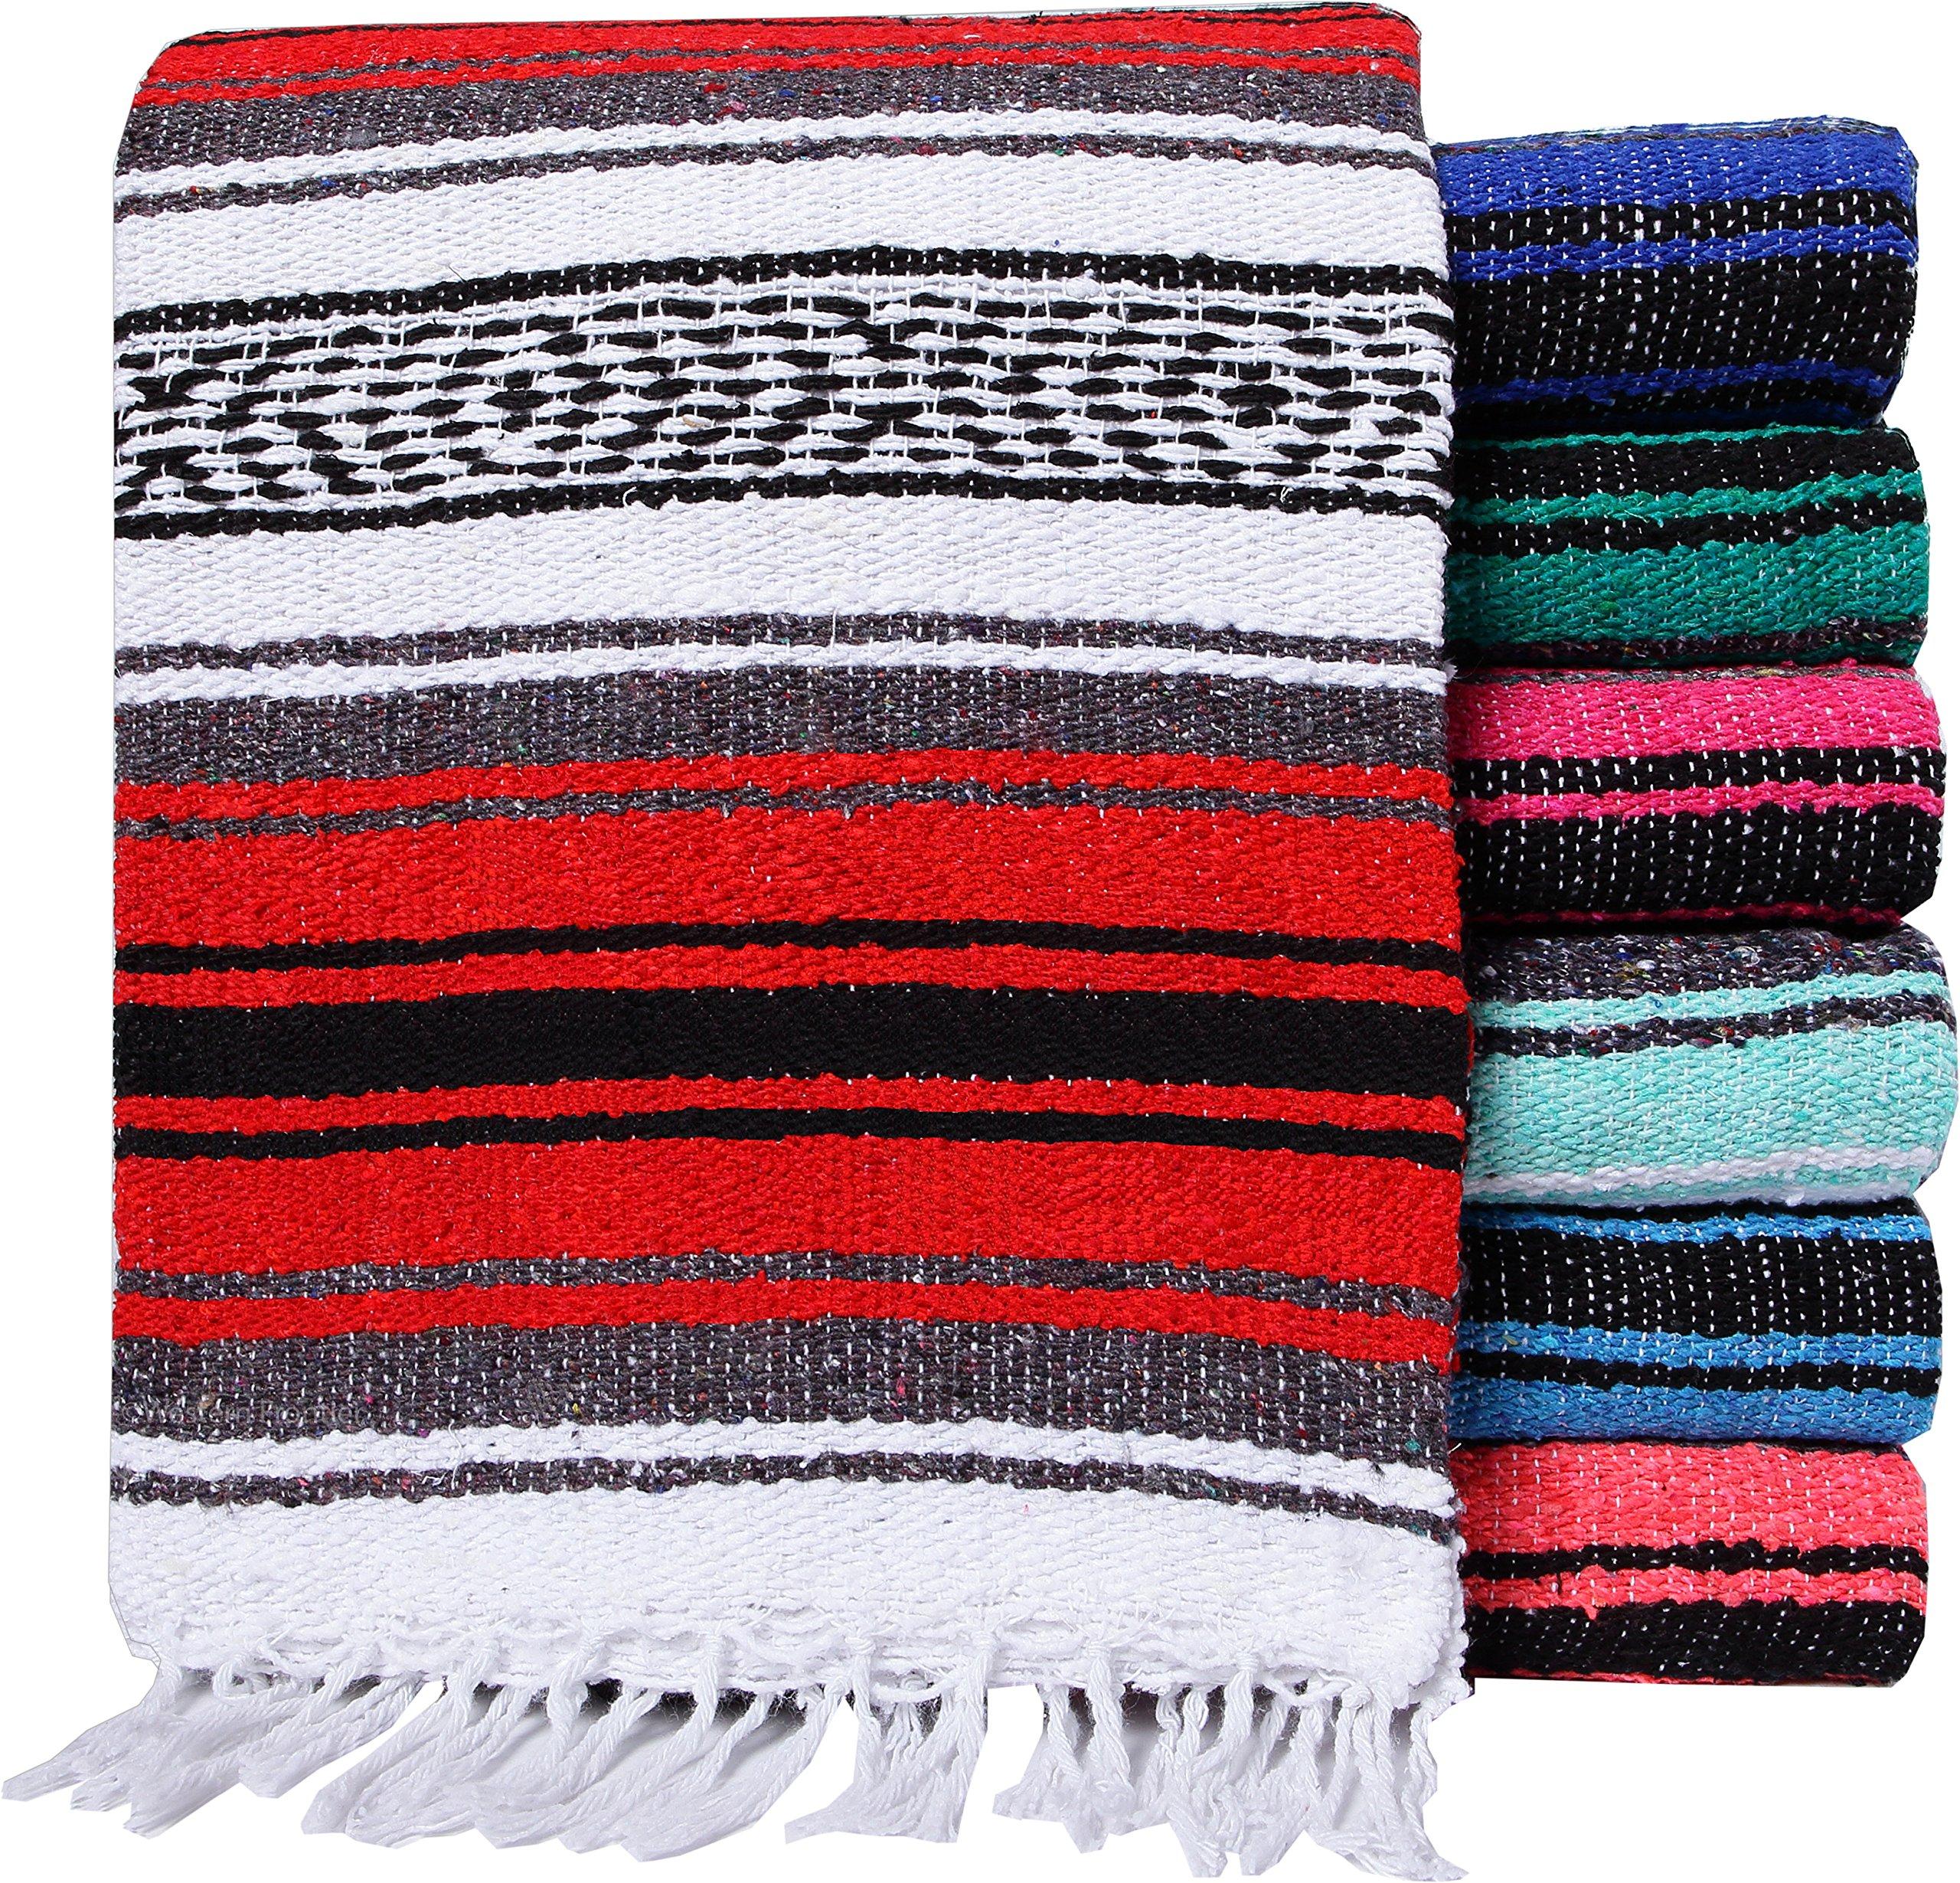 El Paso Designs Genuine Mexican Falsa Blanket - Yoga Studio Blanket, Colorful, Soft Woven Serape Imported from Mexico (Random Color)